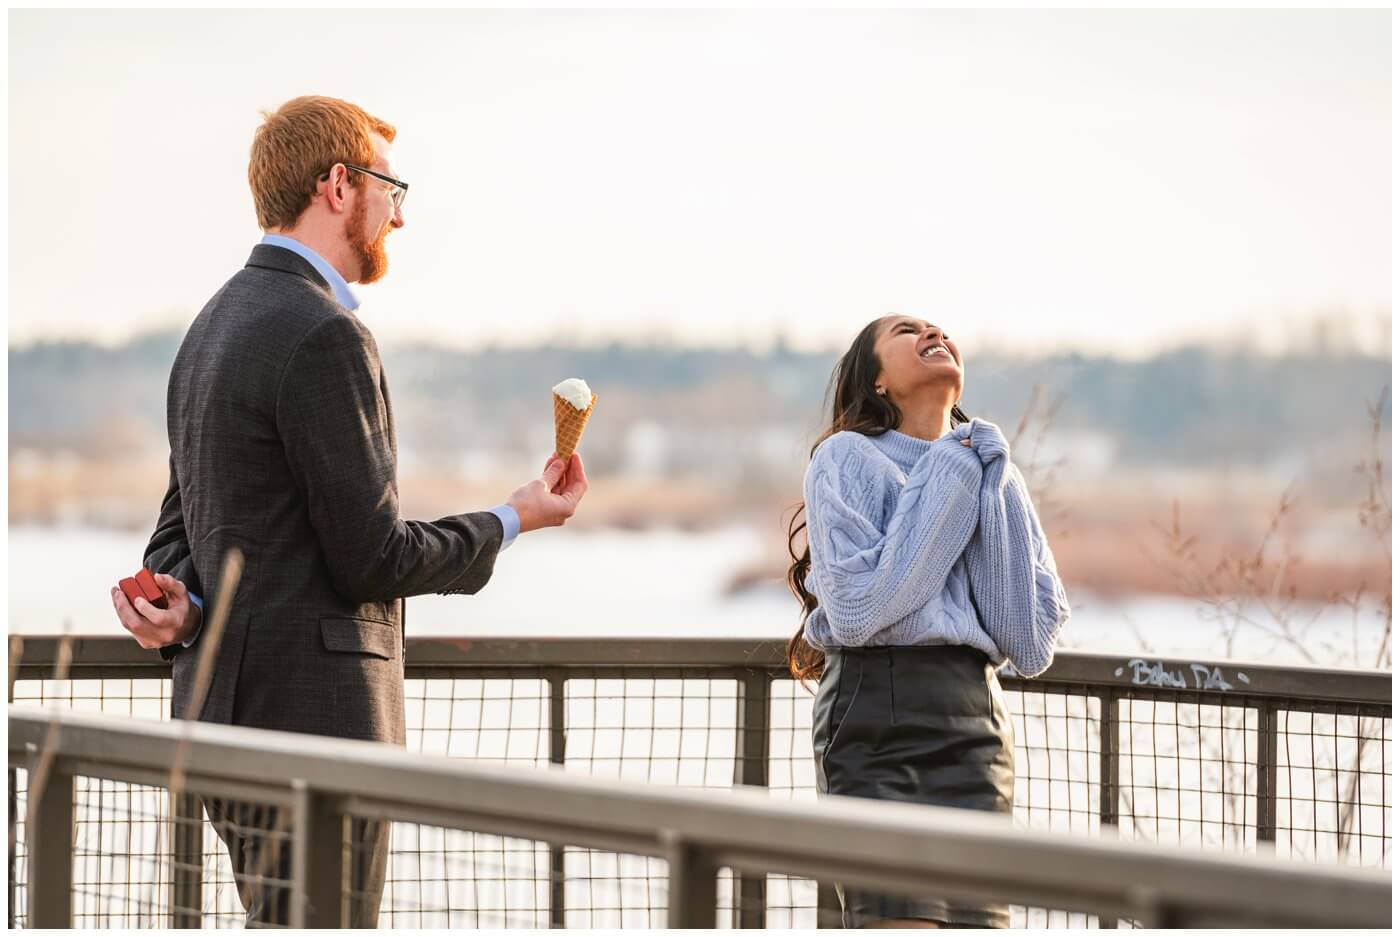 Regina Engagement Photography - Stephen & Sarah - 001 - Surpise Ice Cream Proposal